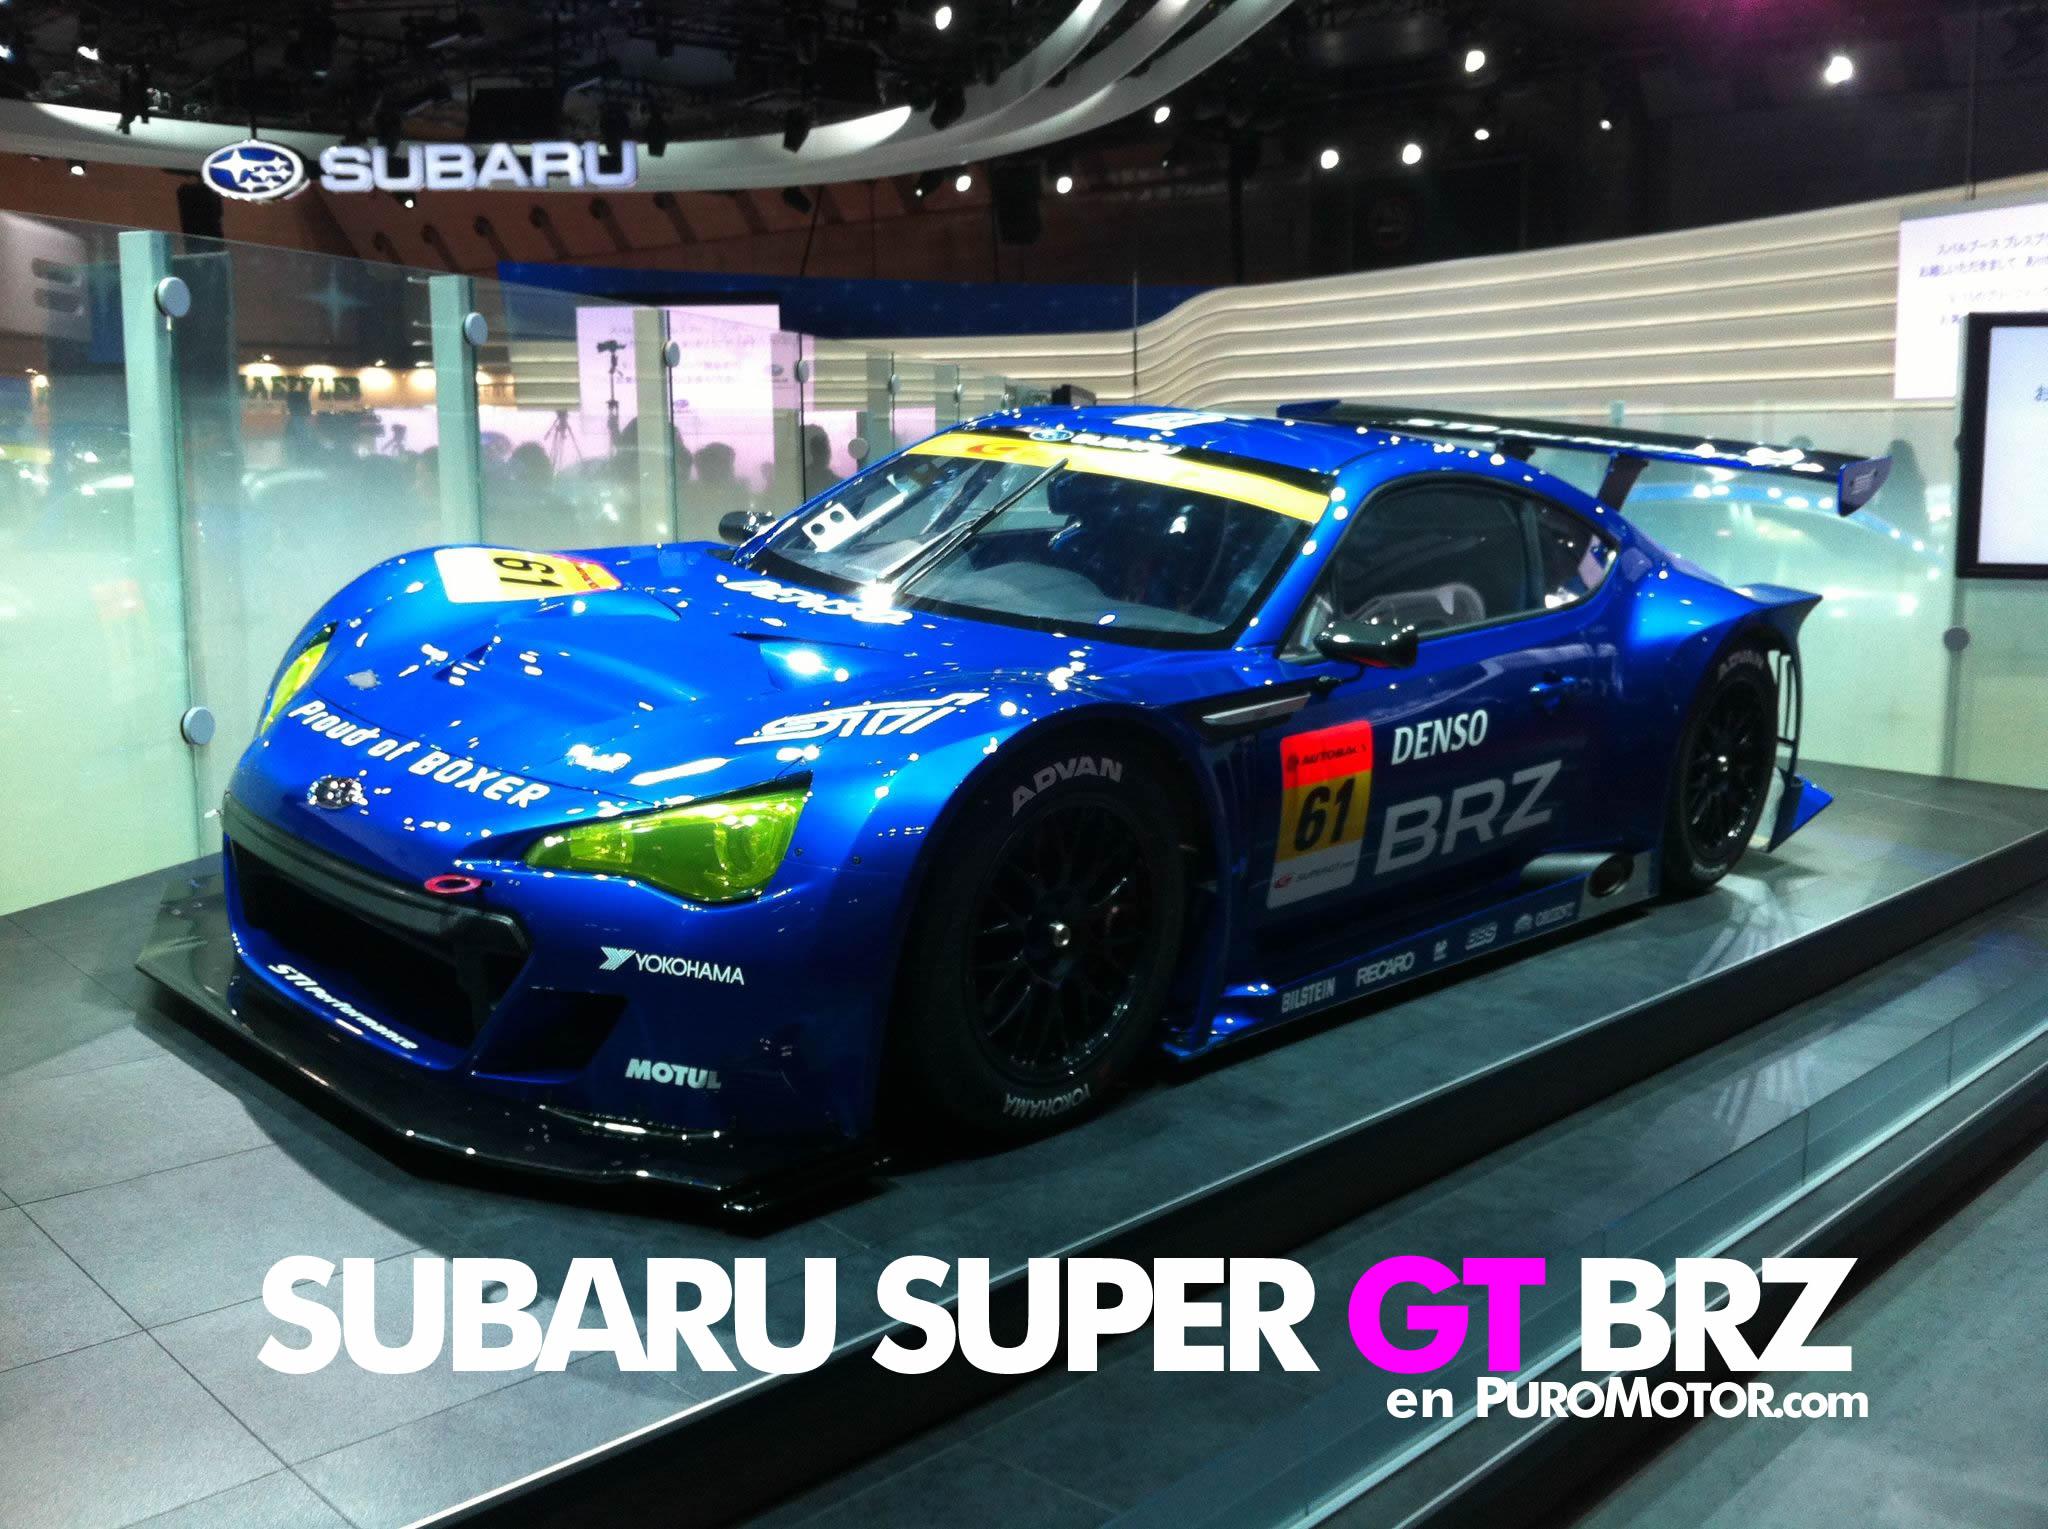 SUBARU_SUPER_GT_BRZ